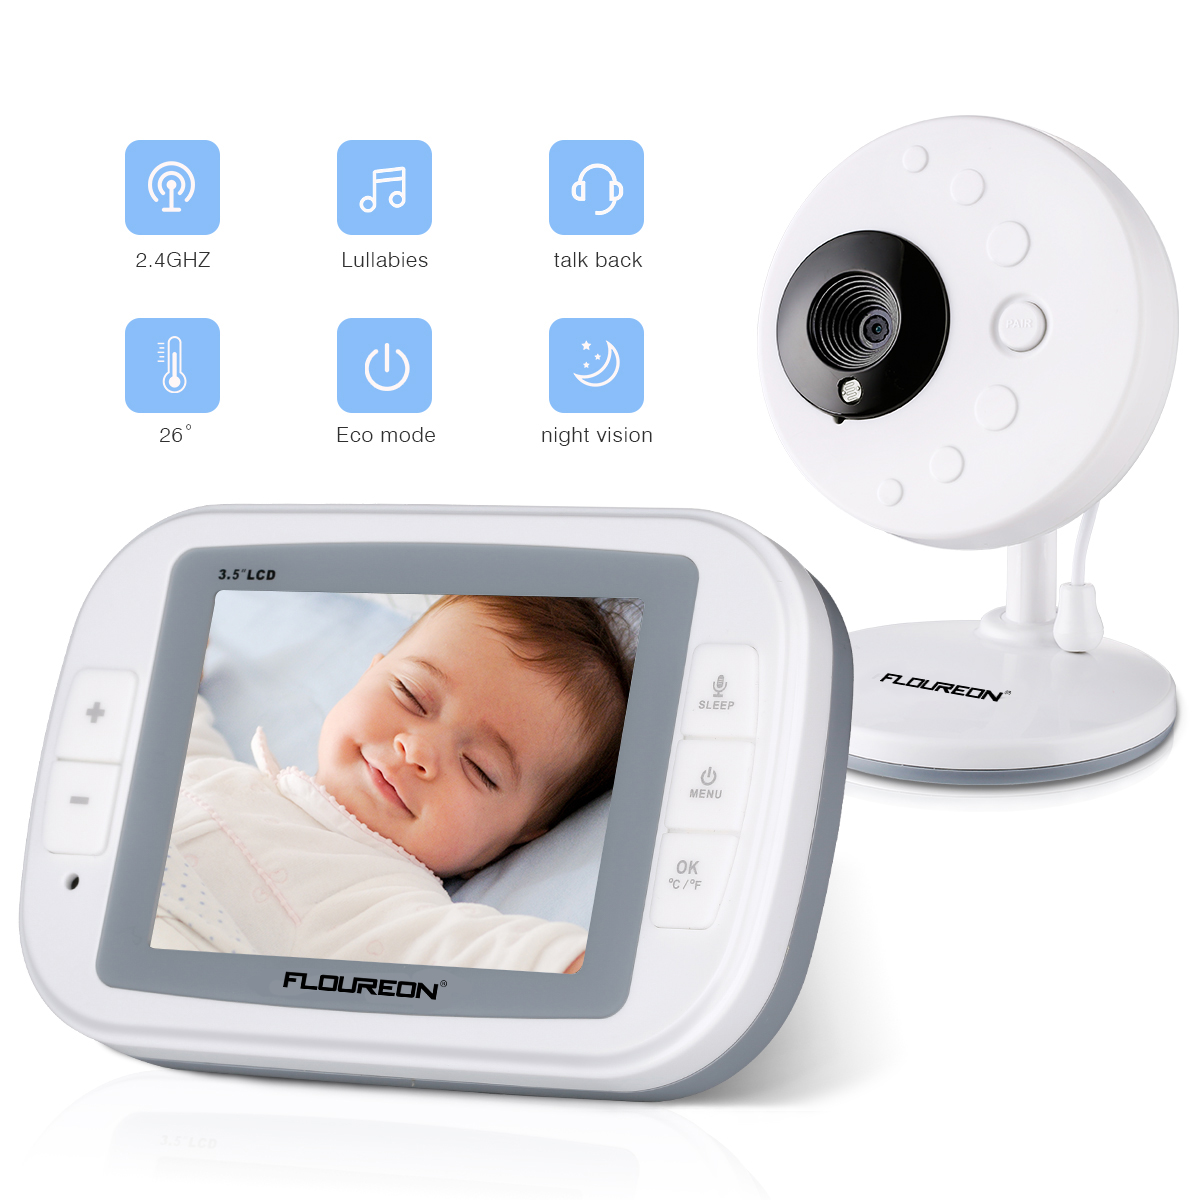 FLOUREON 3.5 Inch Digital Wireless 2.4 GHz Kids Baby Monitor LCD Video Nanny Security Camera Temperature Display 2 Way Talk Night Vision Lullabies Temperature Detection Talk-back Intercom Radio